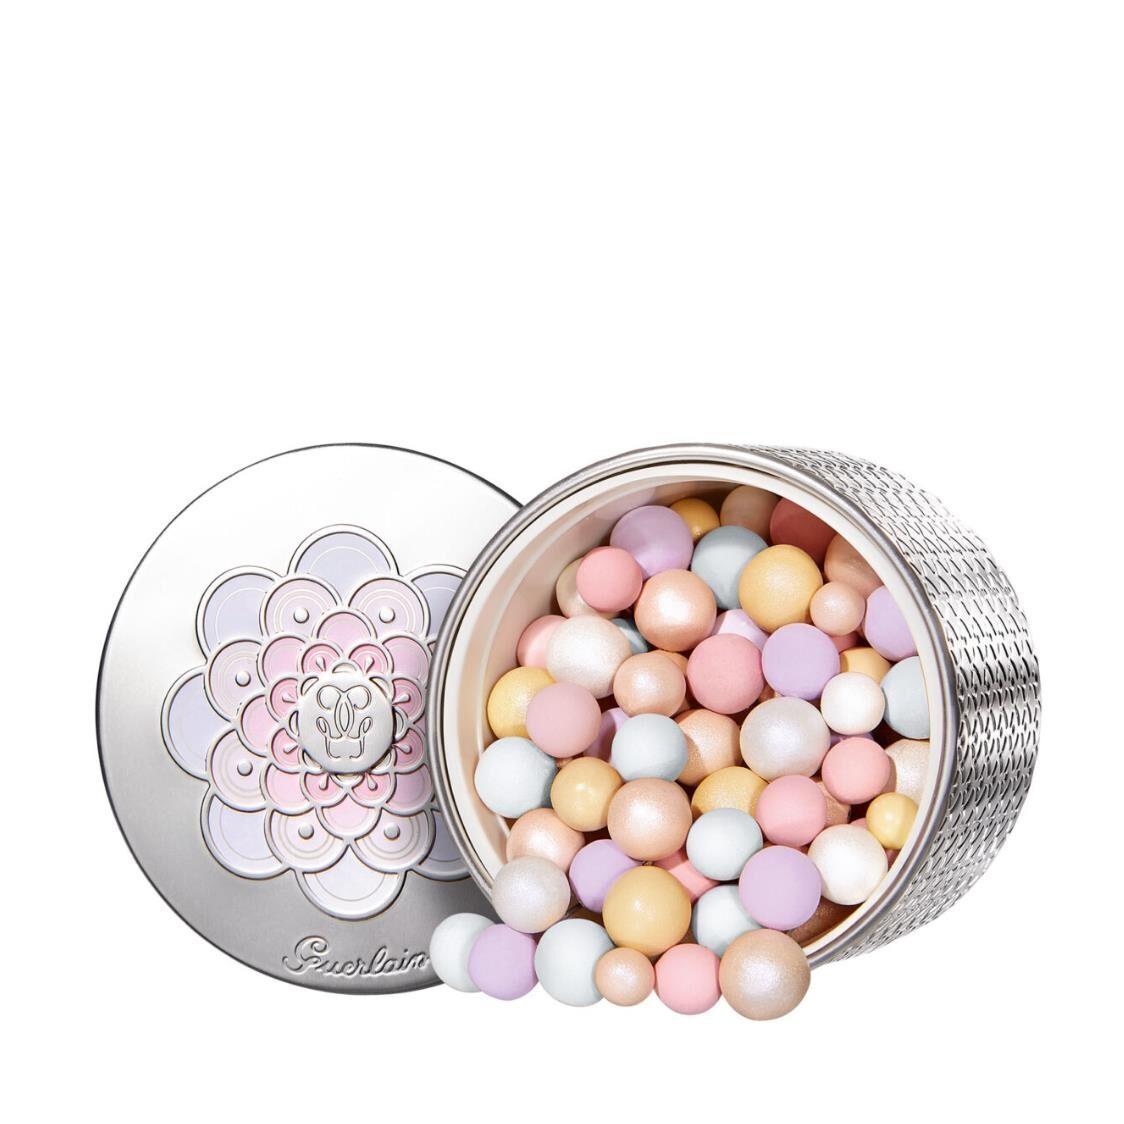 Guerlain Mtorites Light Revealing Pearls Of Powder